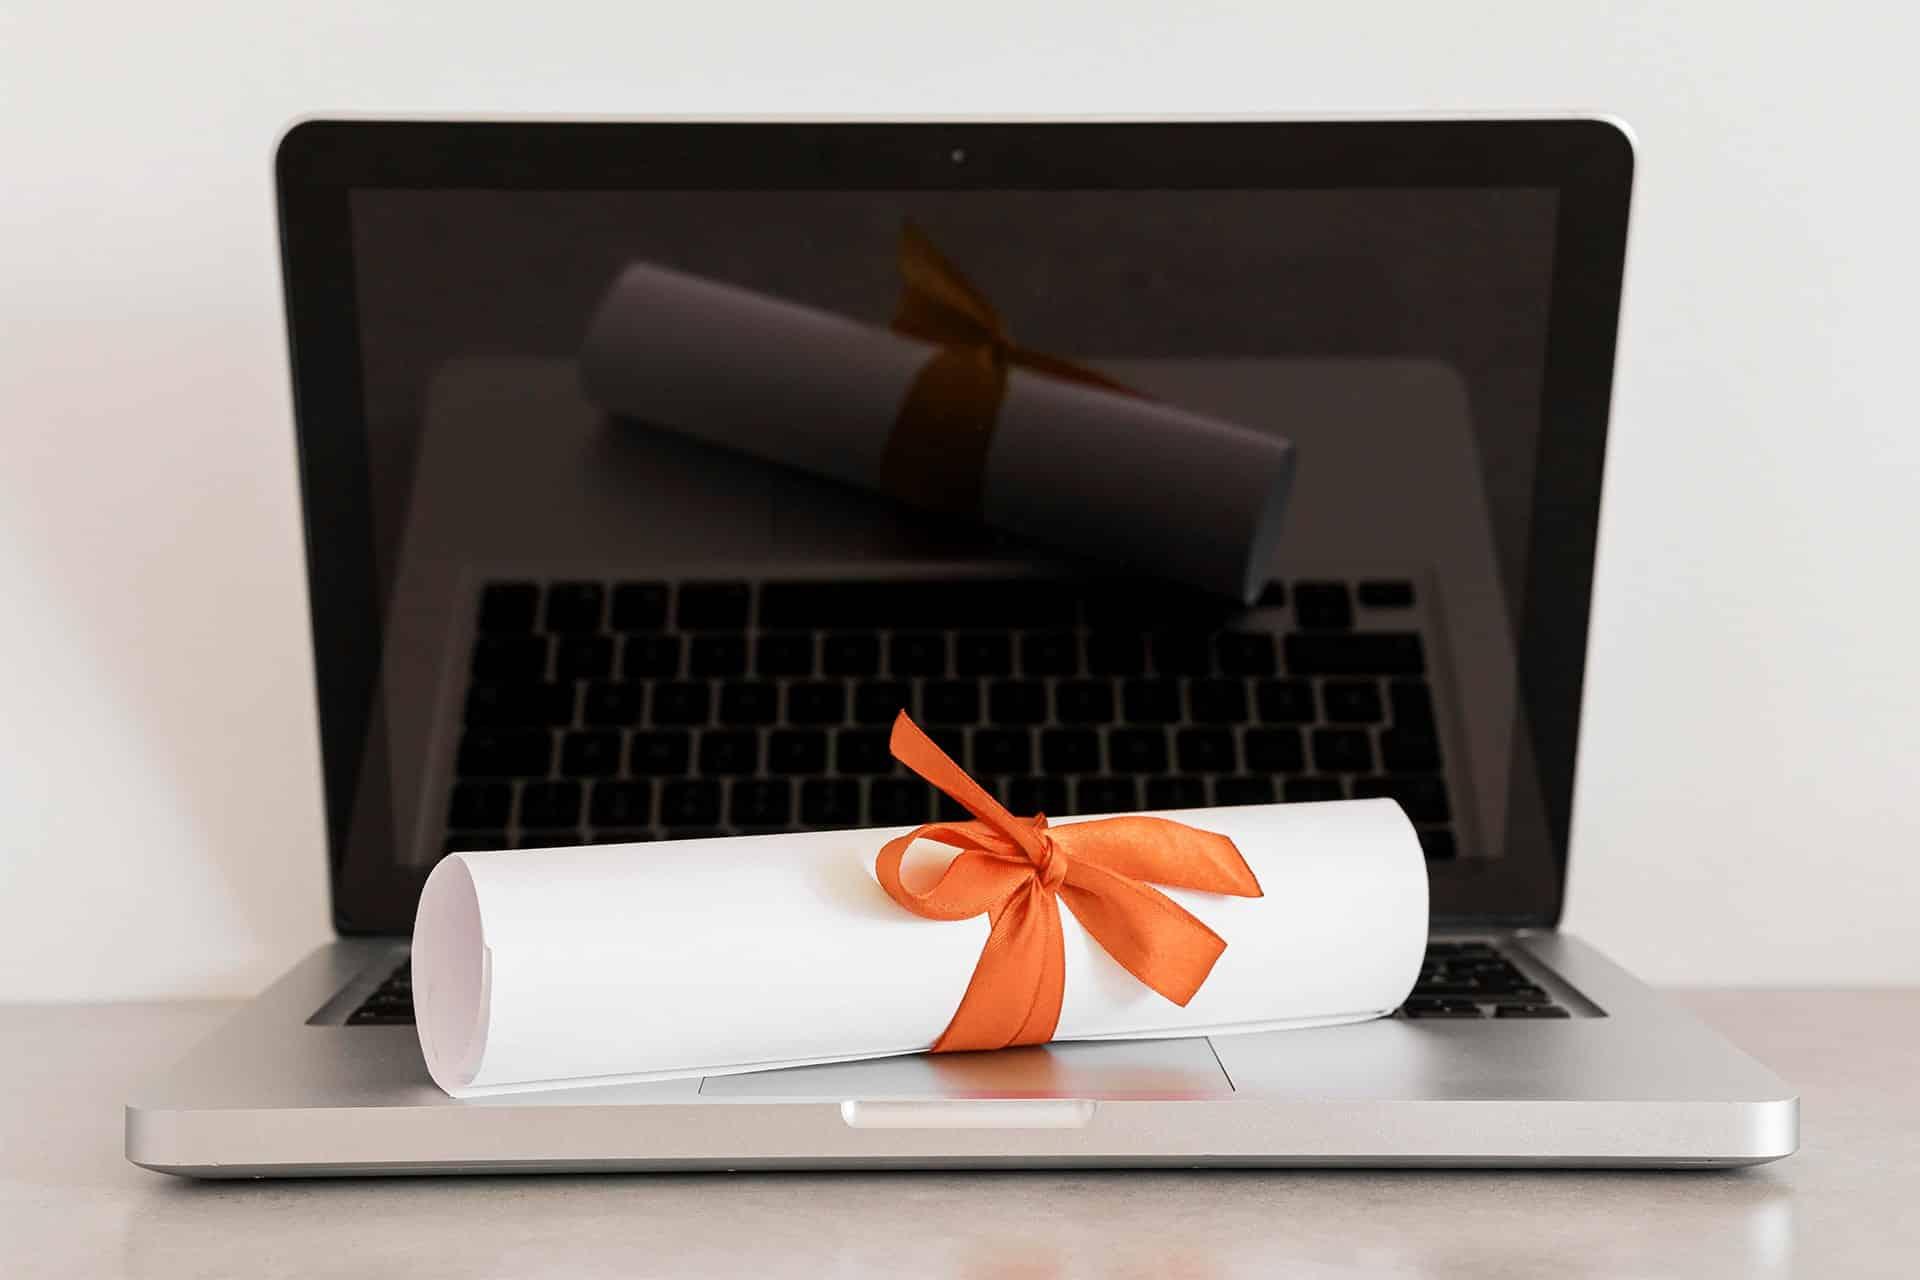 Titulación Diplomado en Habilidades Directivas